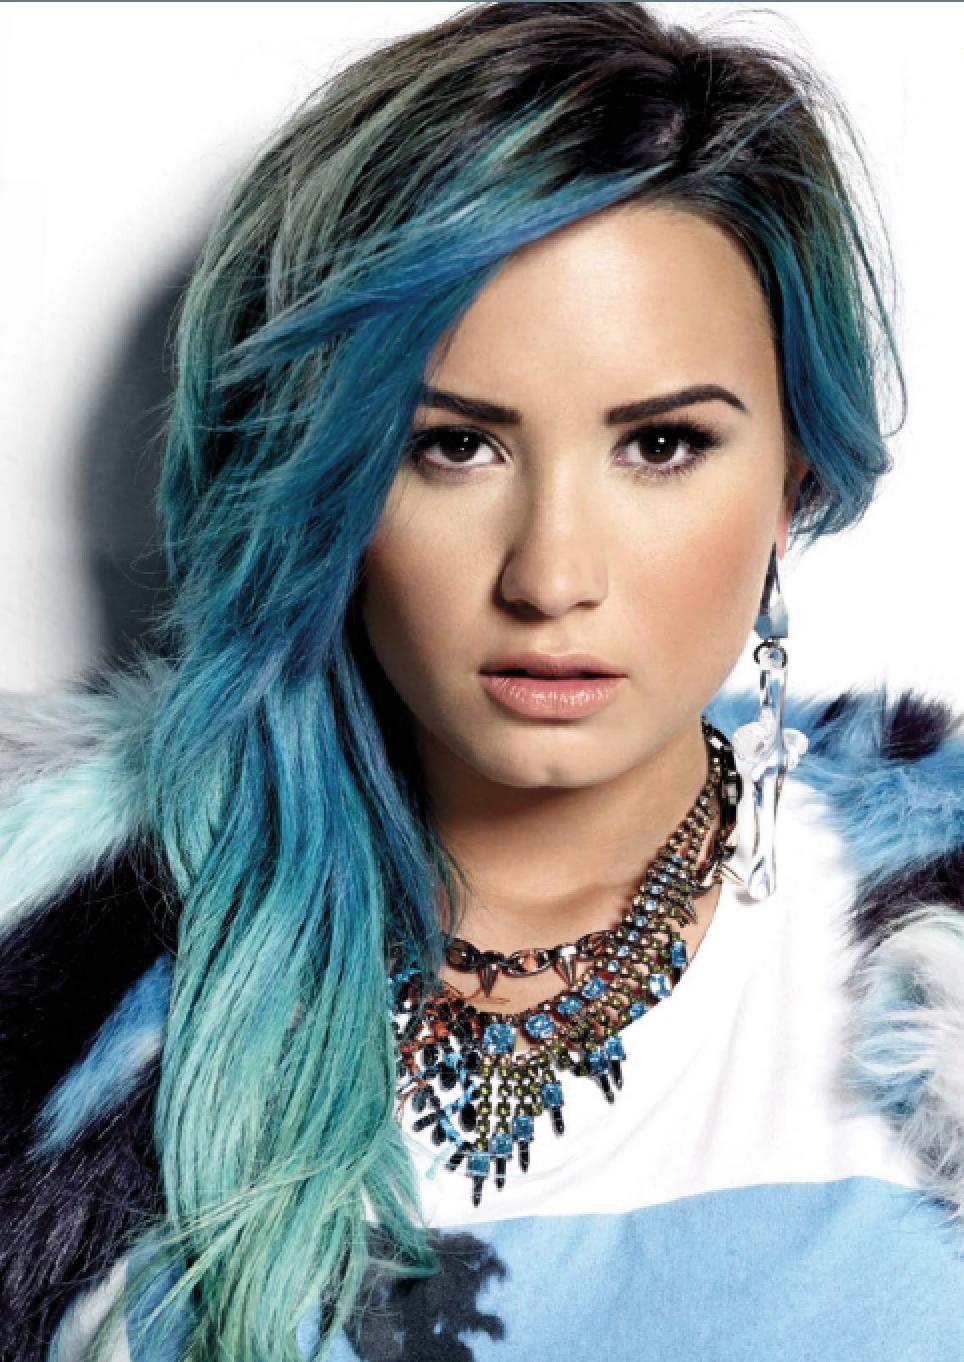 Demi Lovato Blue Hair Ombre Aspirational Fashion Pinterest